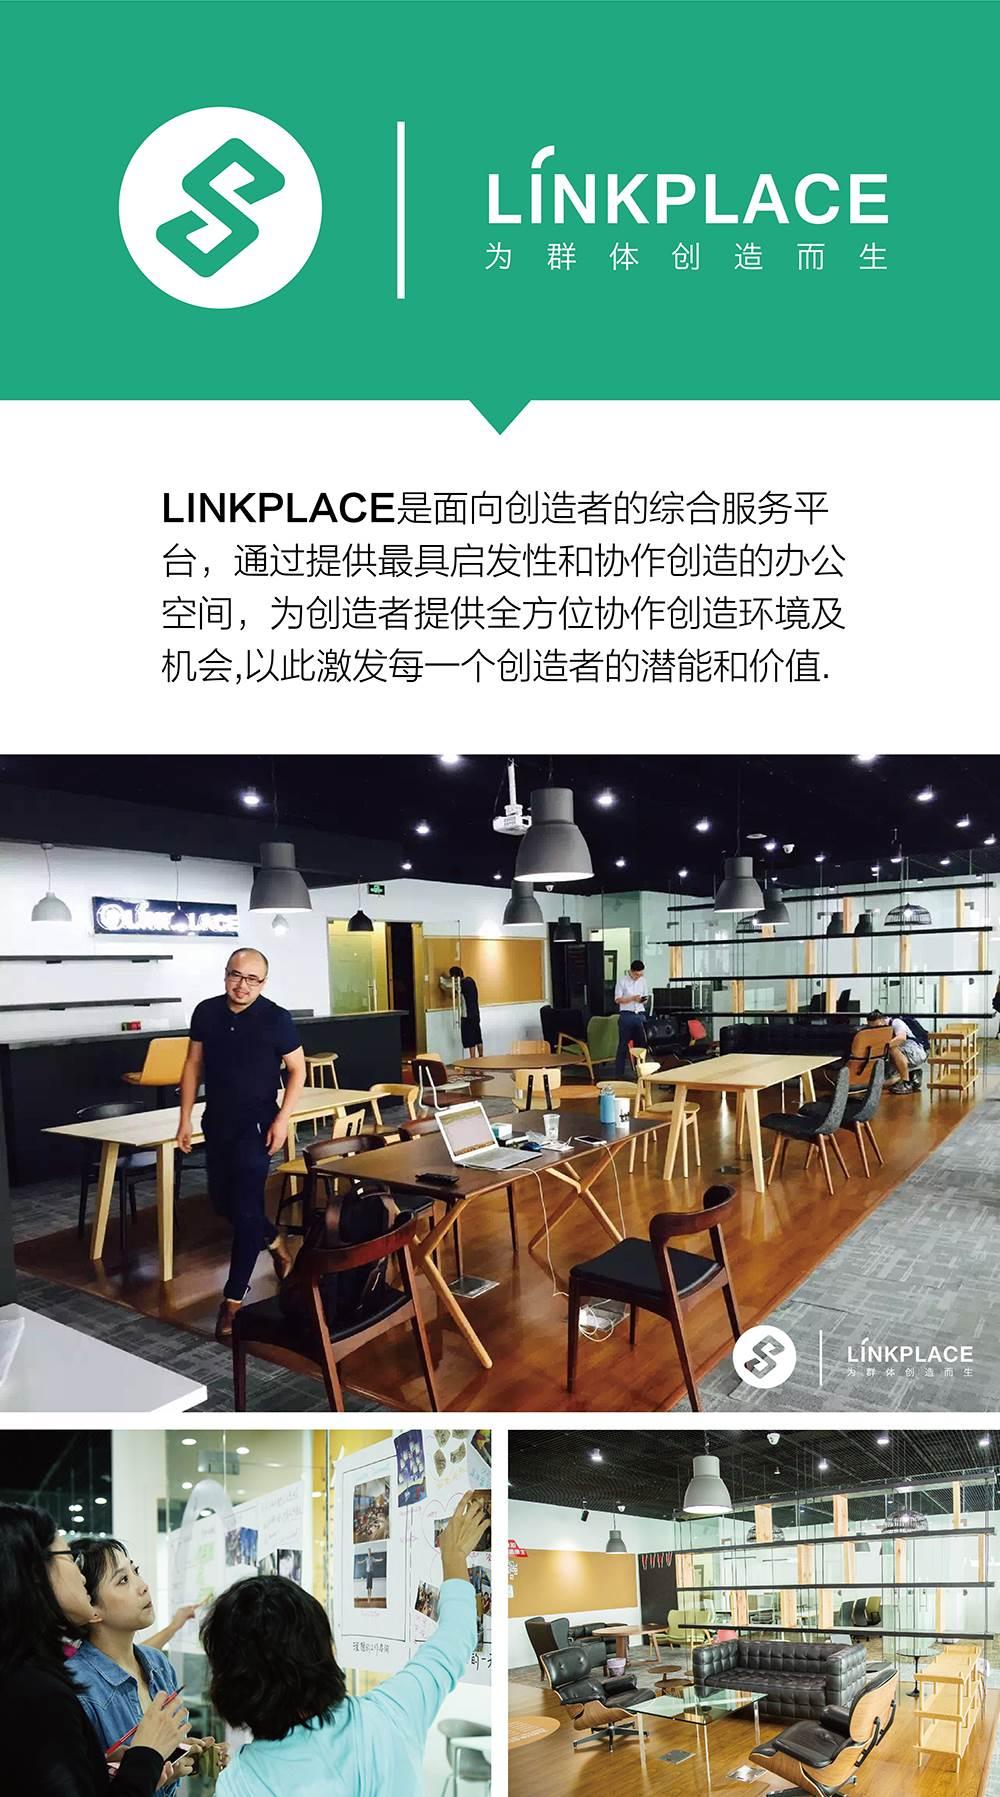 Linkplace海报10月28日.jpg